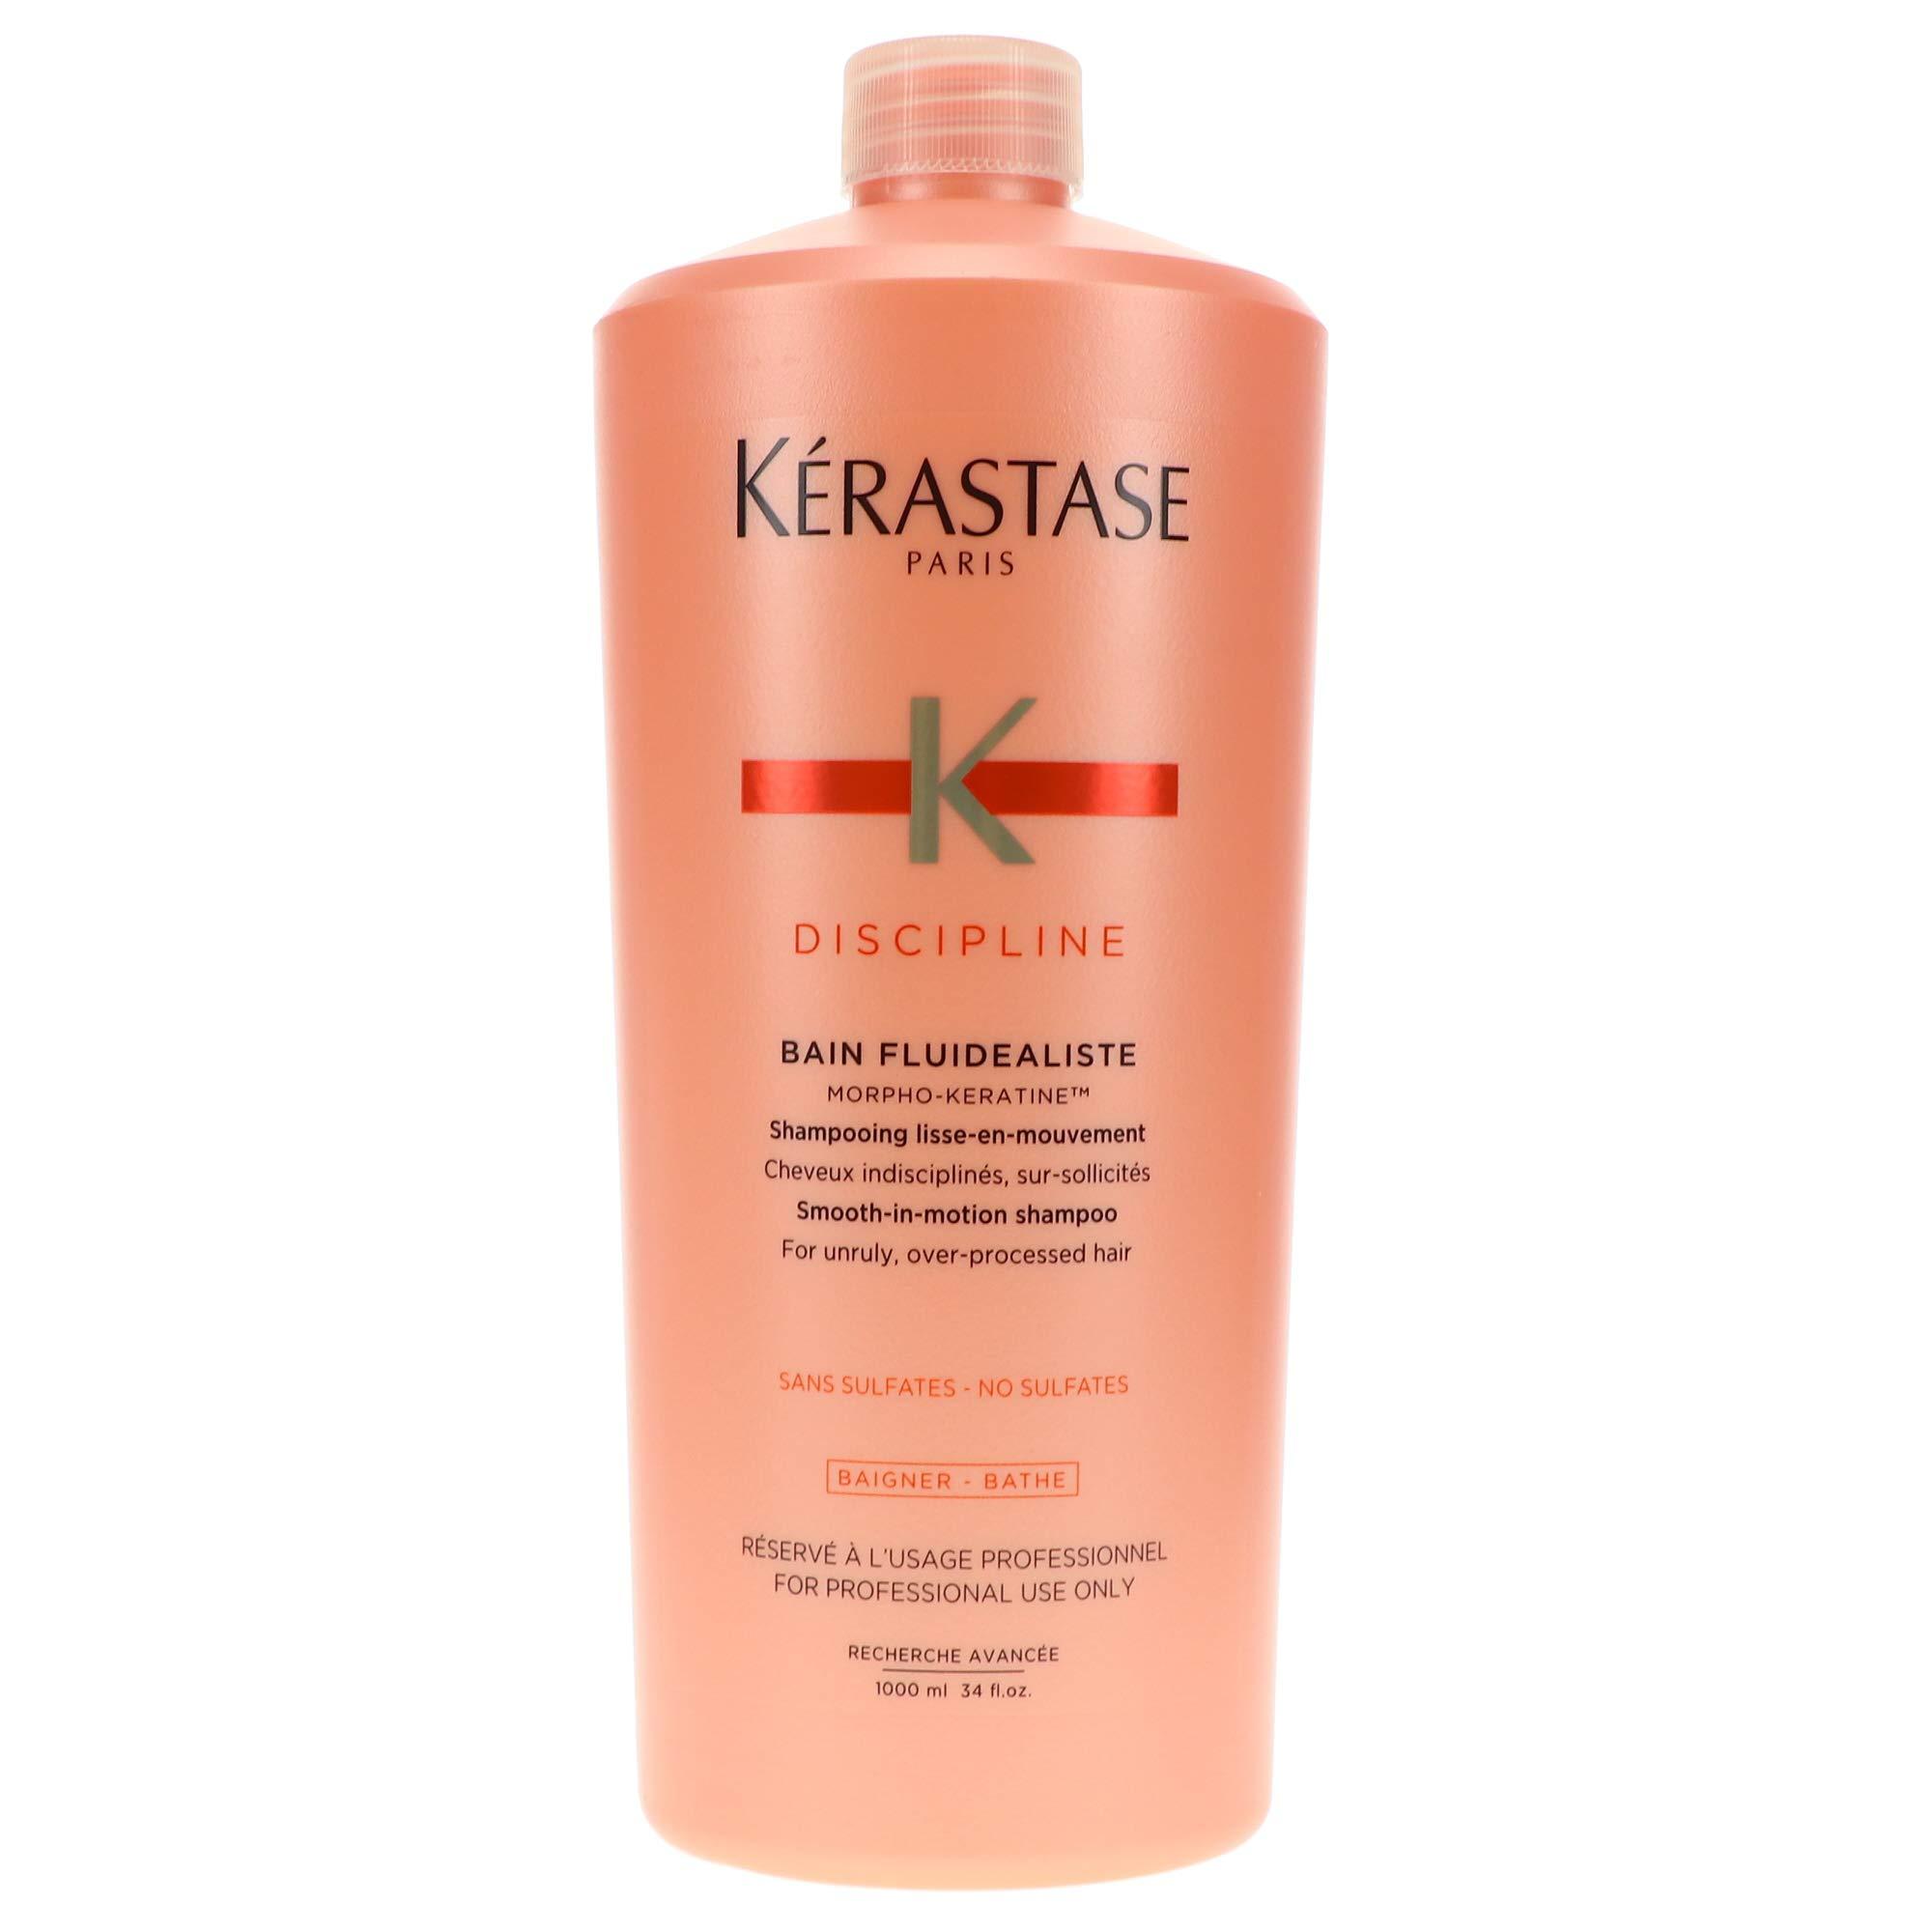 Kerastase Discipline Bain Fluidealiste No Sulfate Smooth-in-Motion Shampoo, 34 Ounce